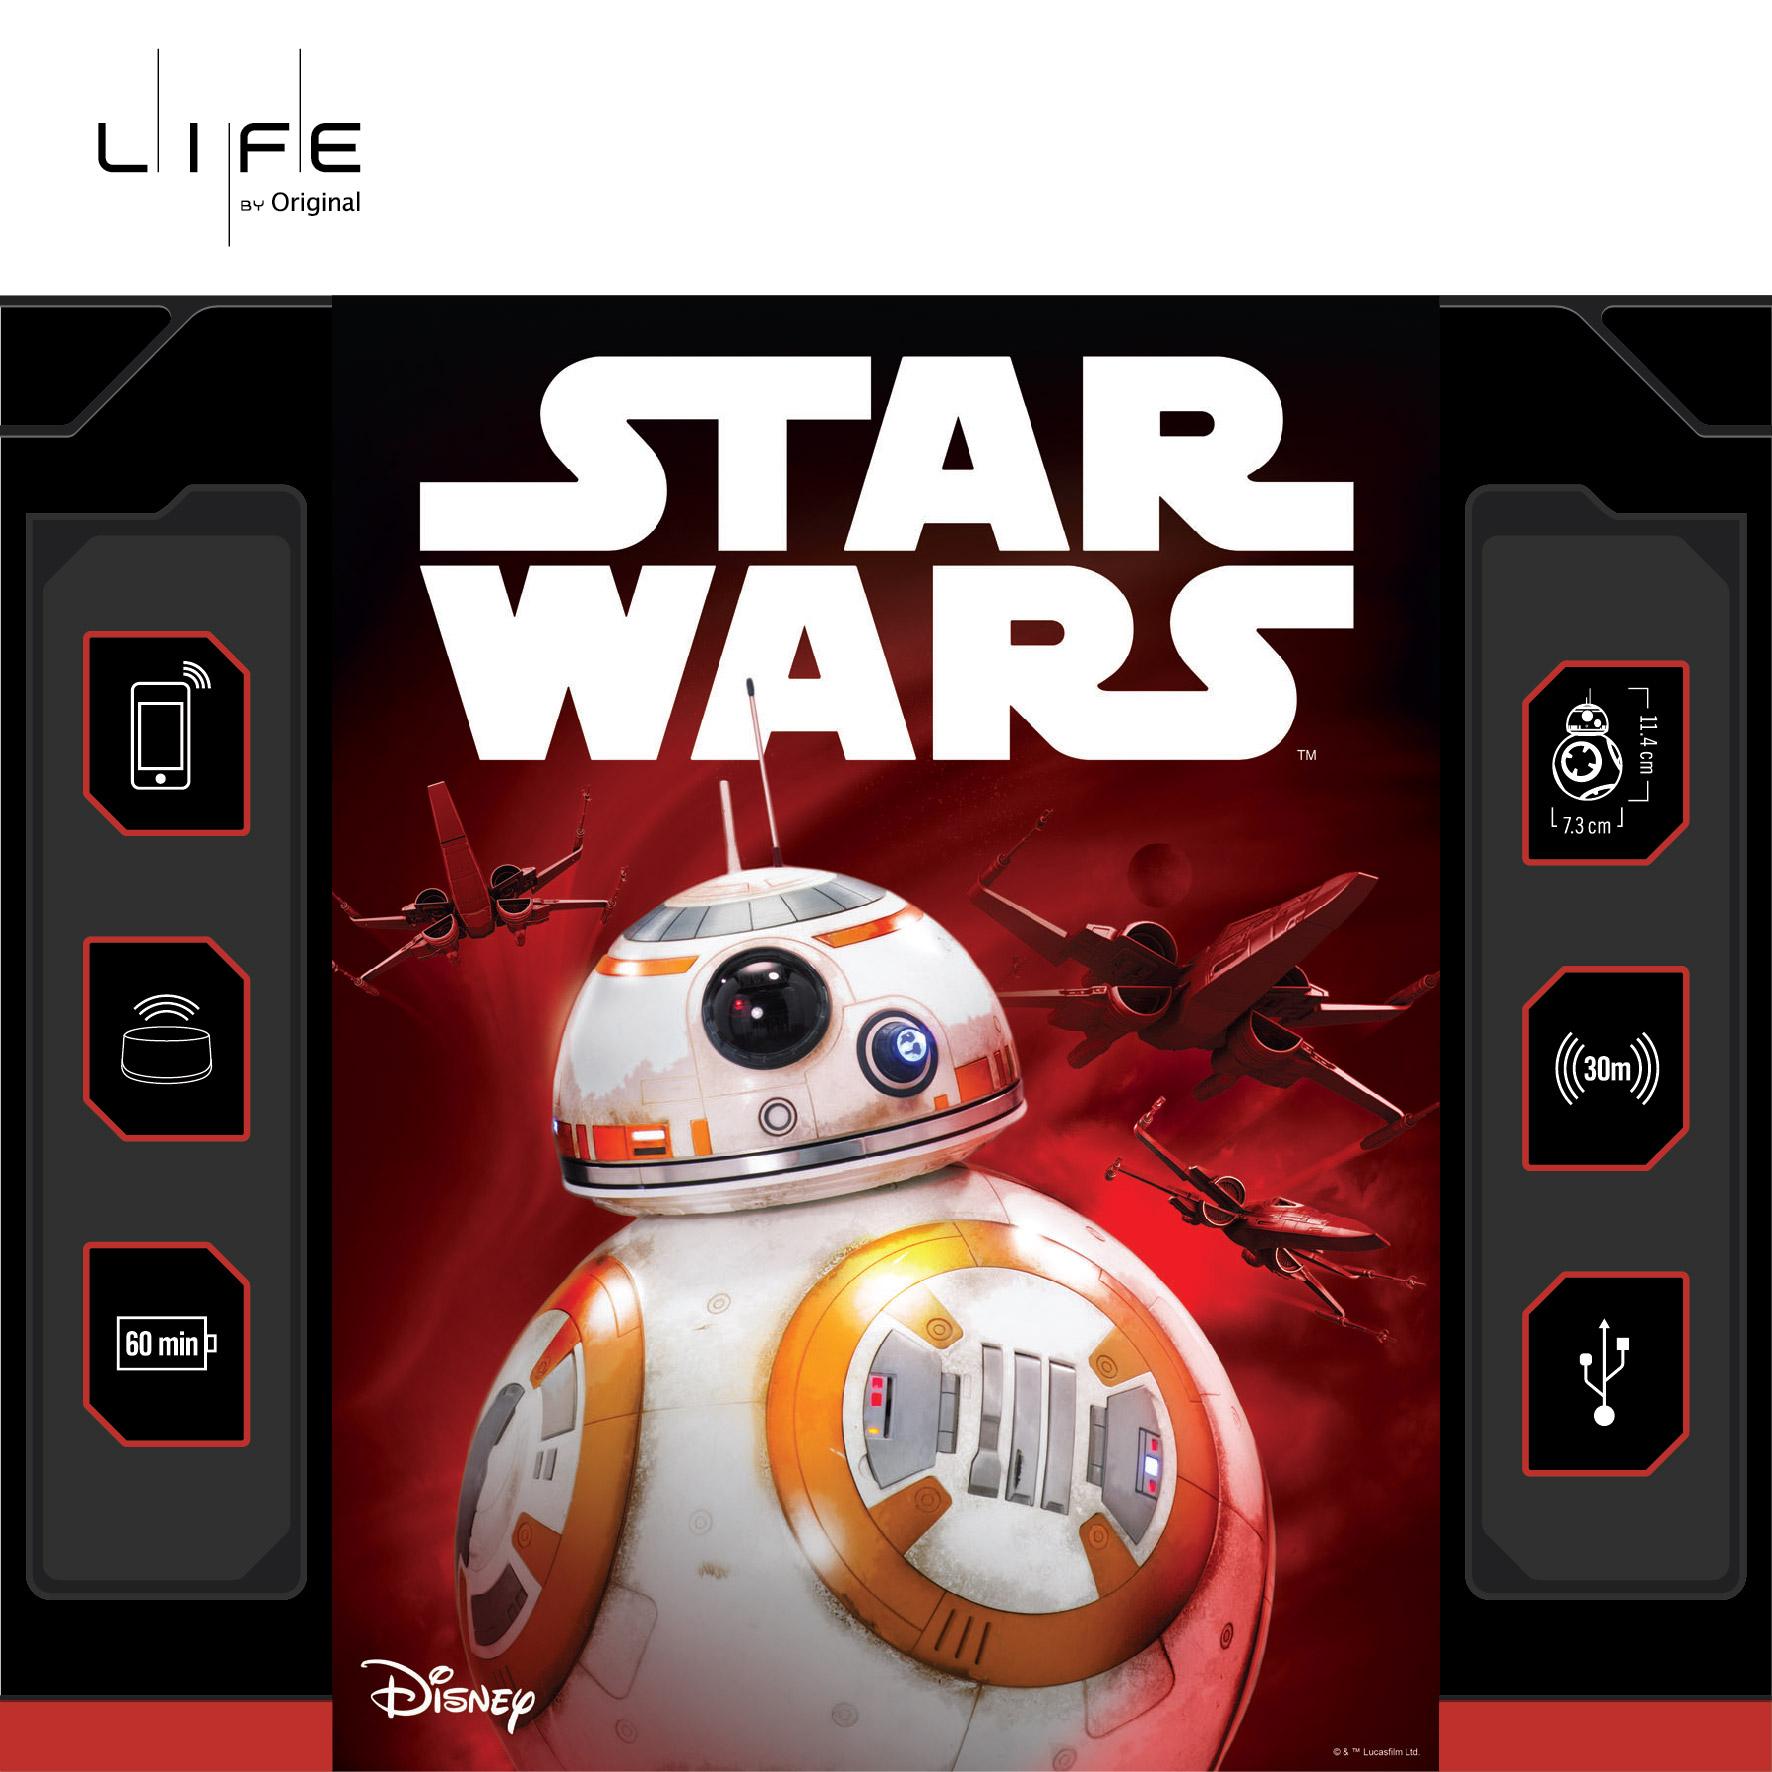 決賽冠軍:智能機械人BB-8 (1個)- MOP 1,238             Champion  : Sphero Star Wars BB-8 Robotic Ball